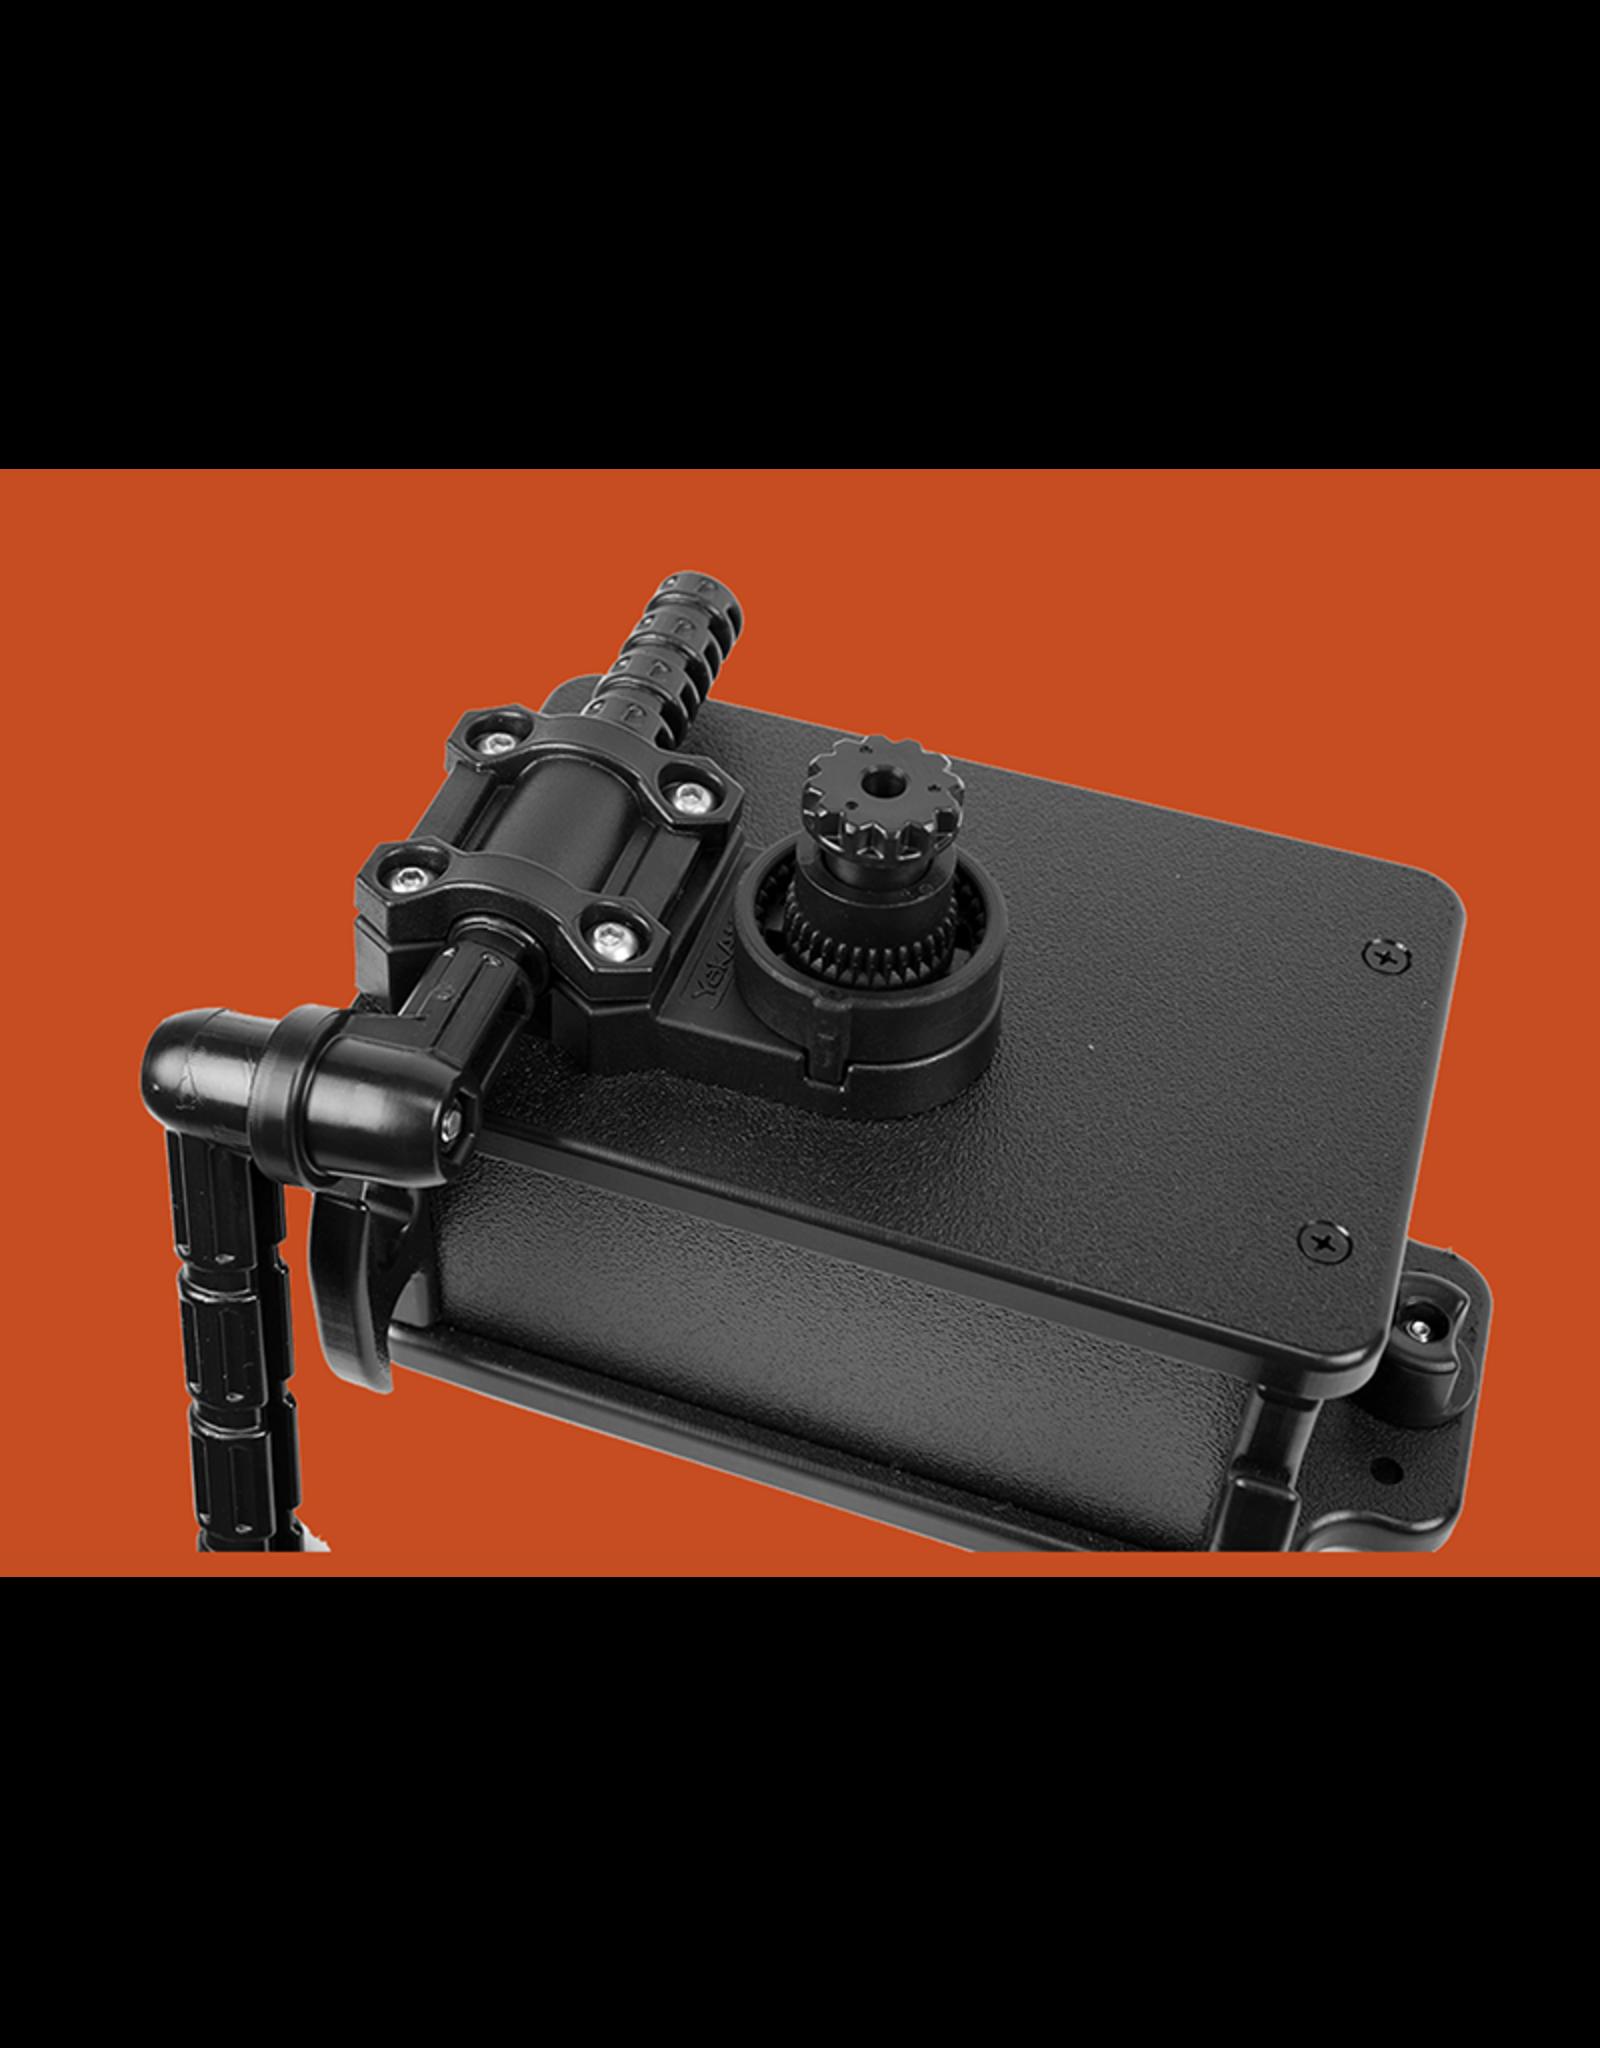 YakAttack SwitchBlade Transducer Deployment Arm